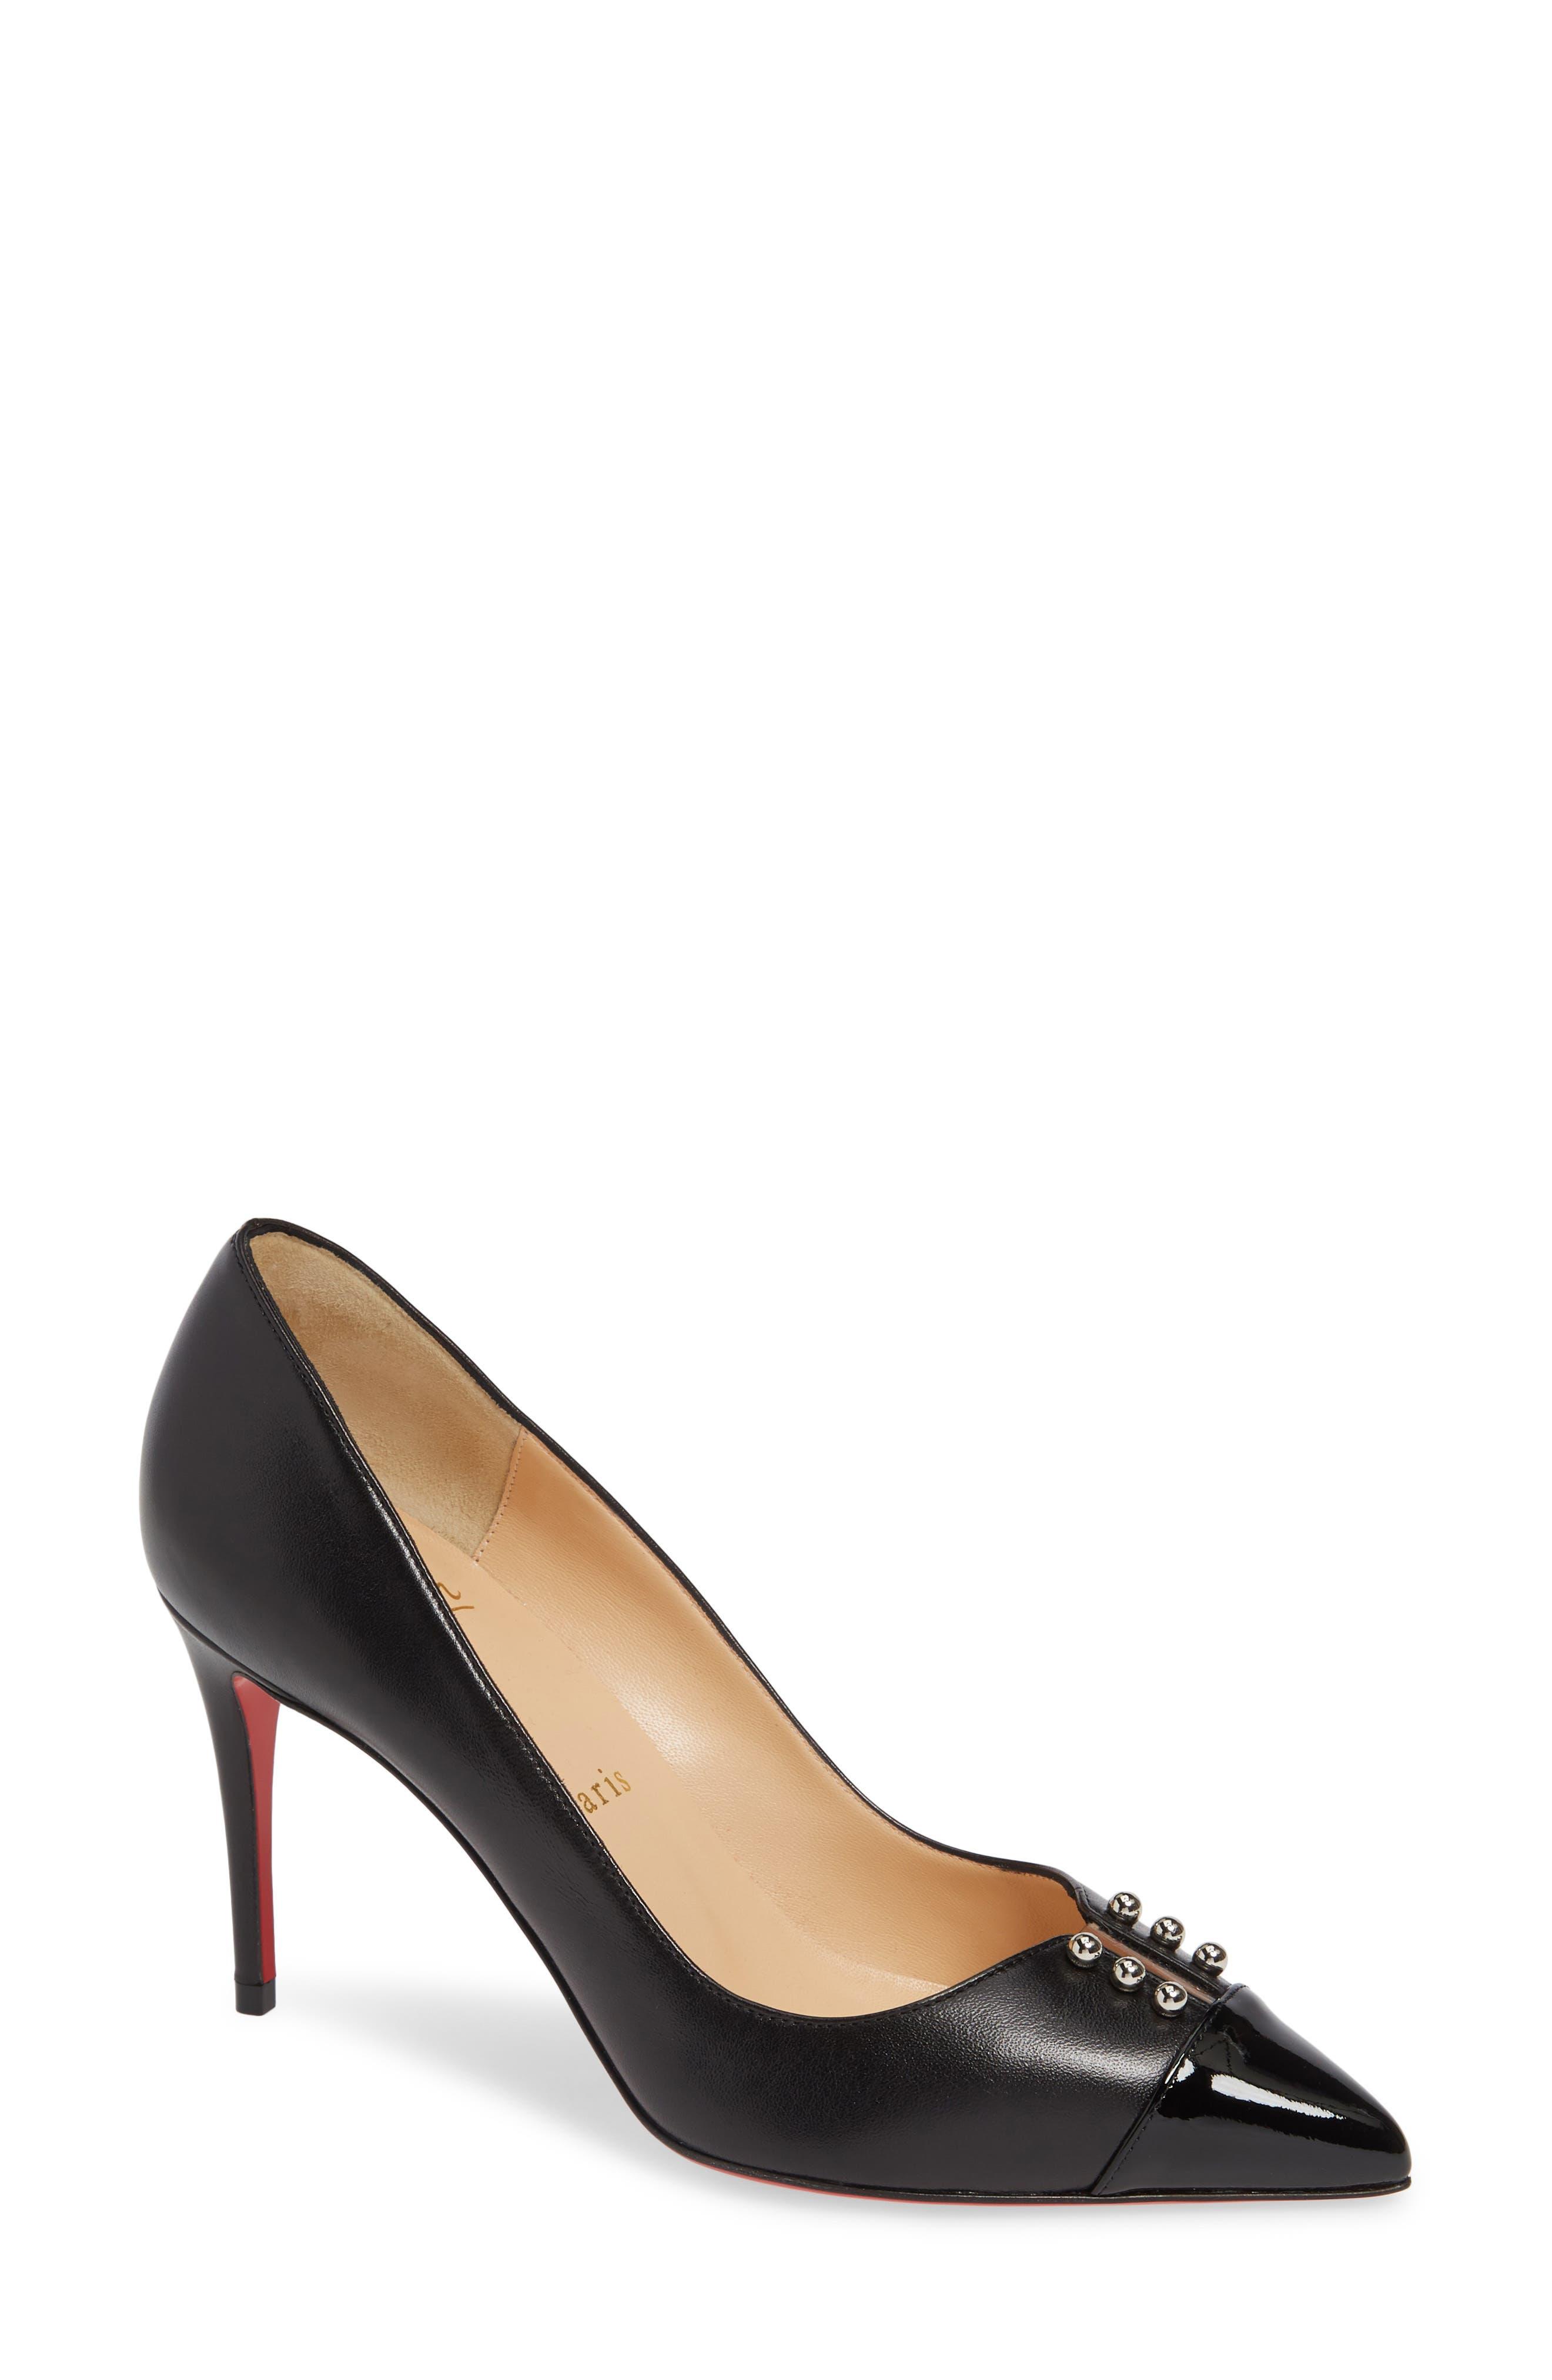 8ee9200cc0f3 ... open toe pump b9cc3 f3890  sale christian louboutin predupump studded pump  women 3ea23 a65bc